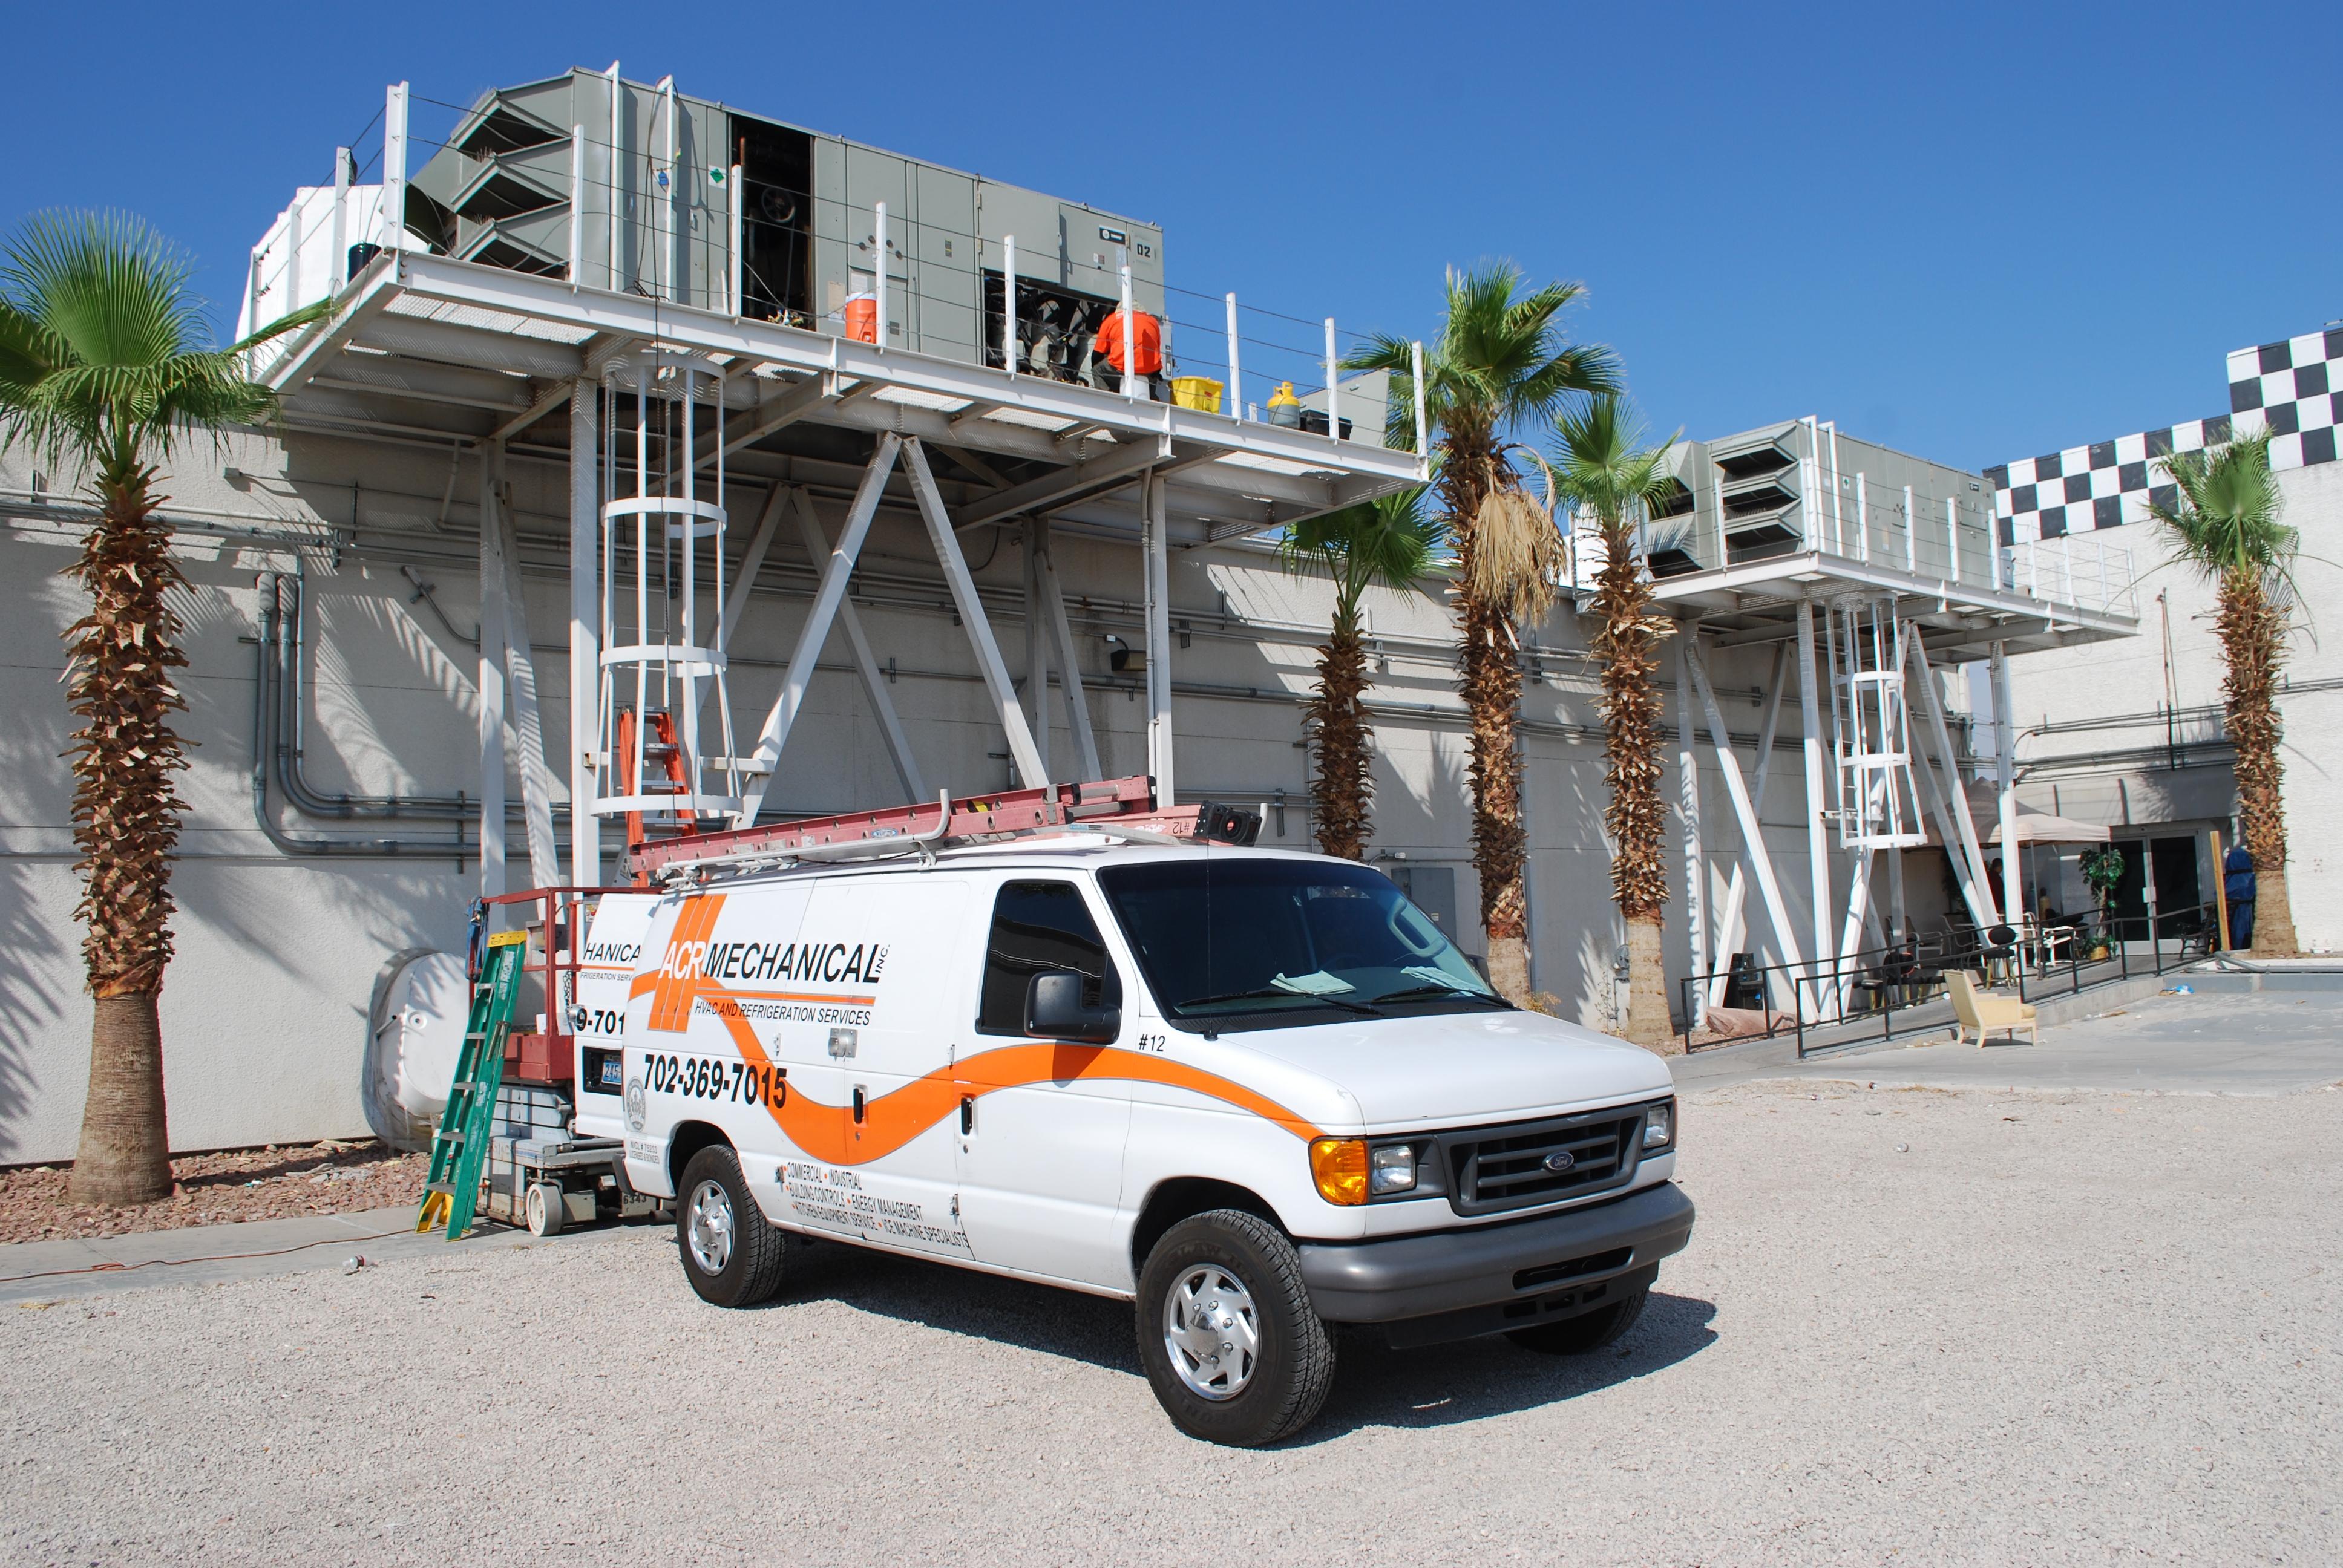 ACR Mechanical Service Technician and work van in Las Vegas